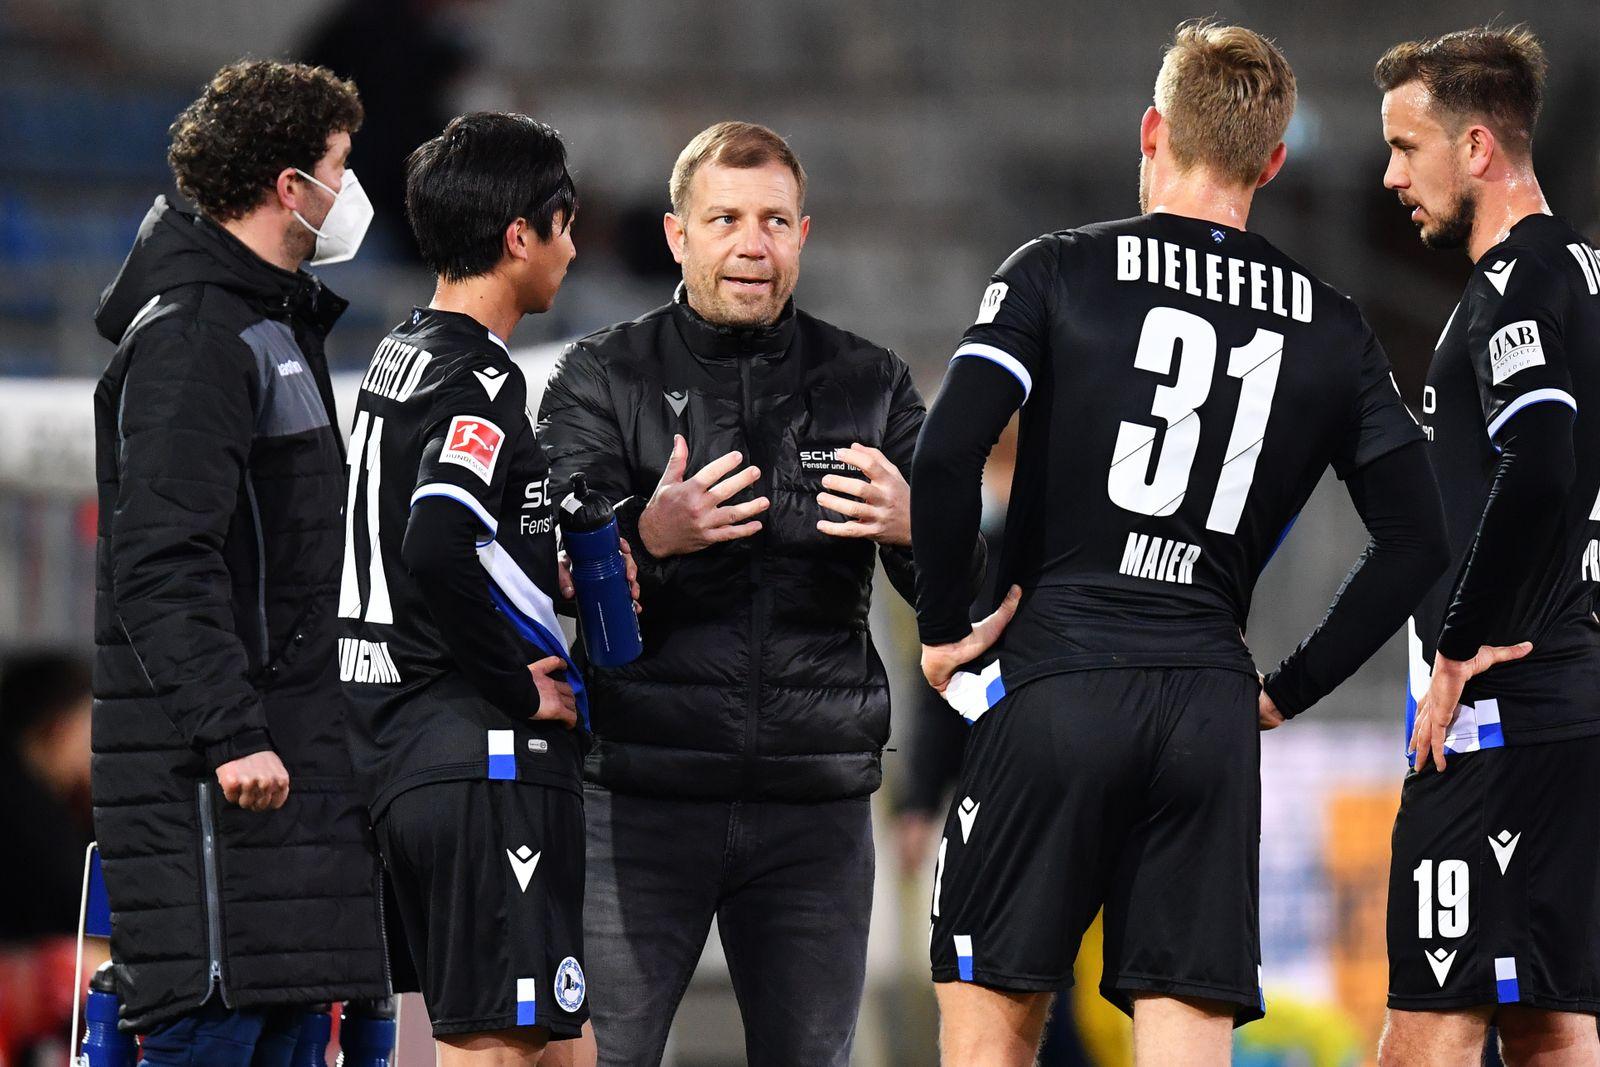 DSC Arminia Bielefeld v 1. FC Union Berlin - Bundesliga